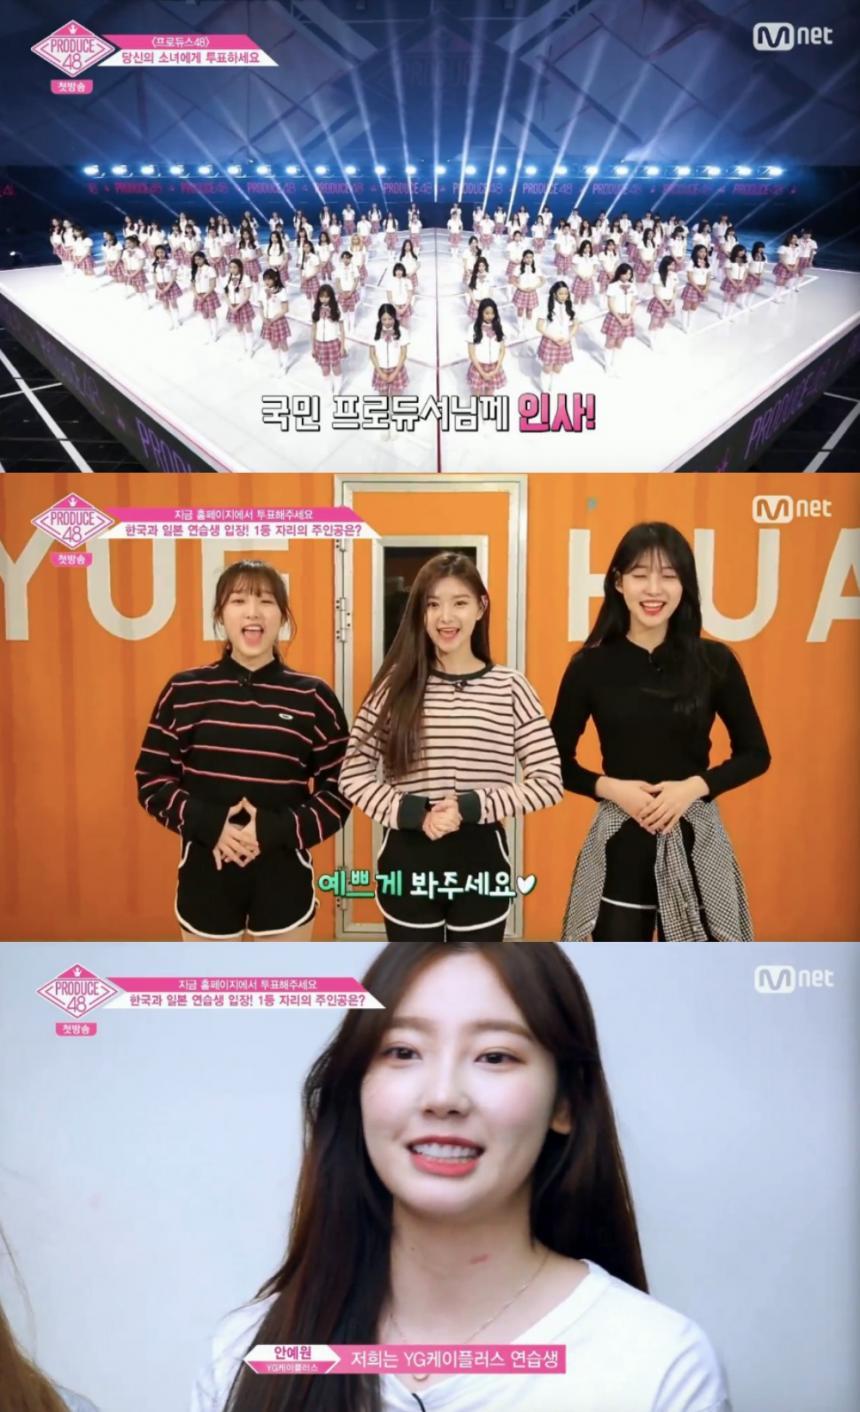 Mnet '프로듀스 48' 방송캡쳐